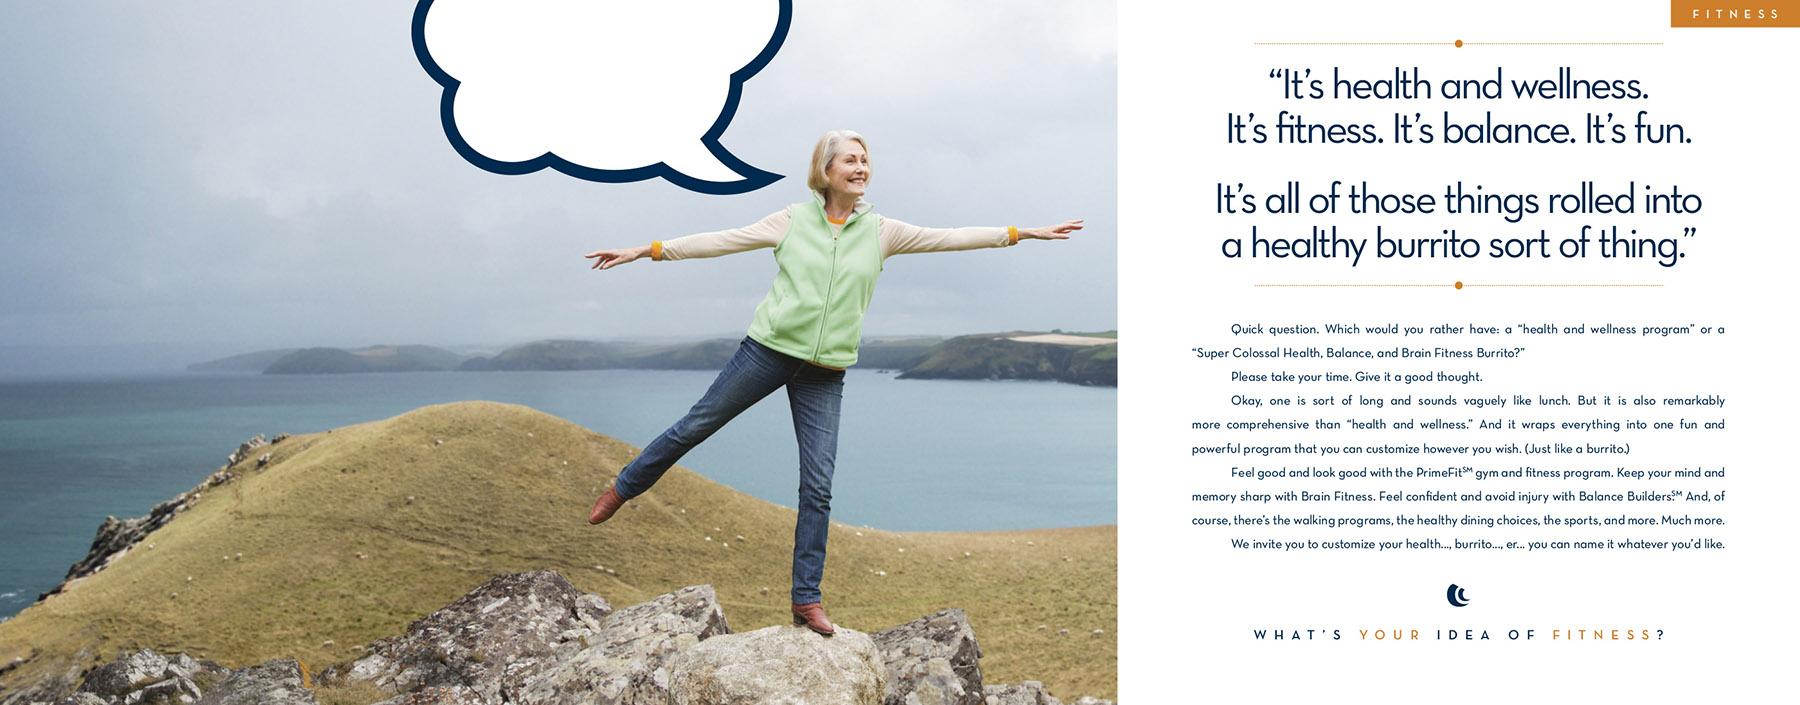 Leisure Care - Retirement Community Brochure